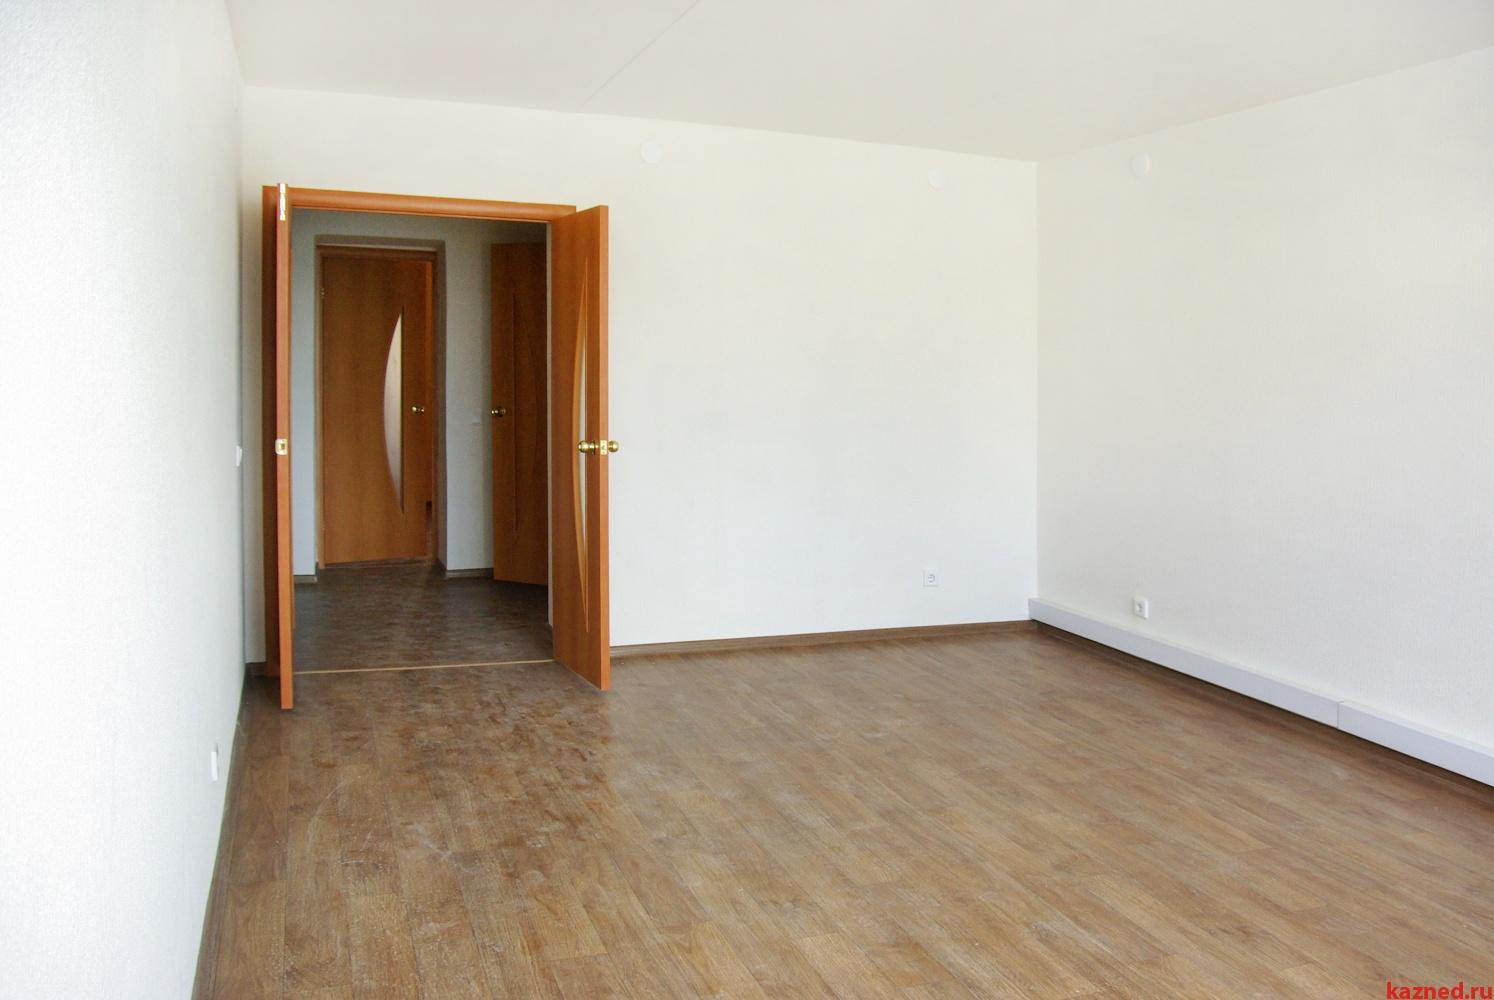 Продажа 1-к квартиры ул.Лукина д.52, 50 м² (миниатюра №1)